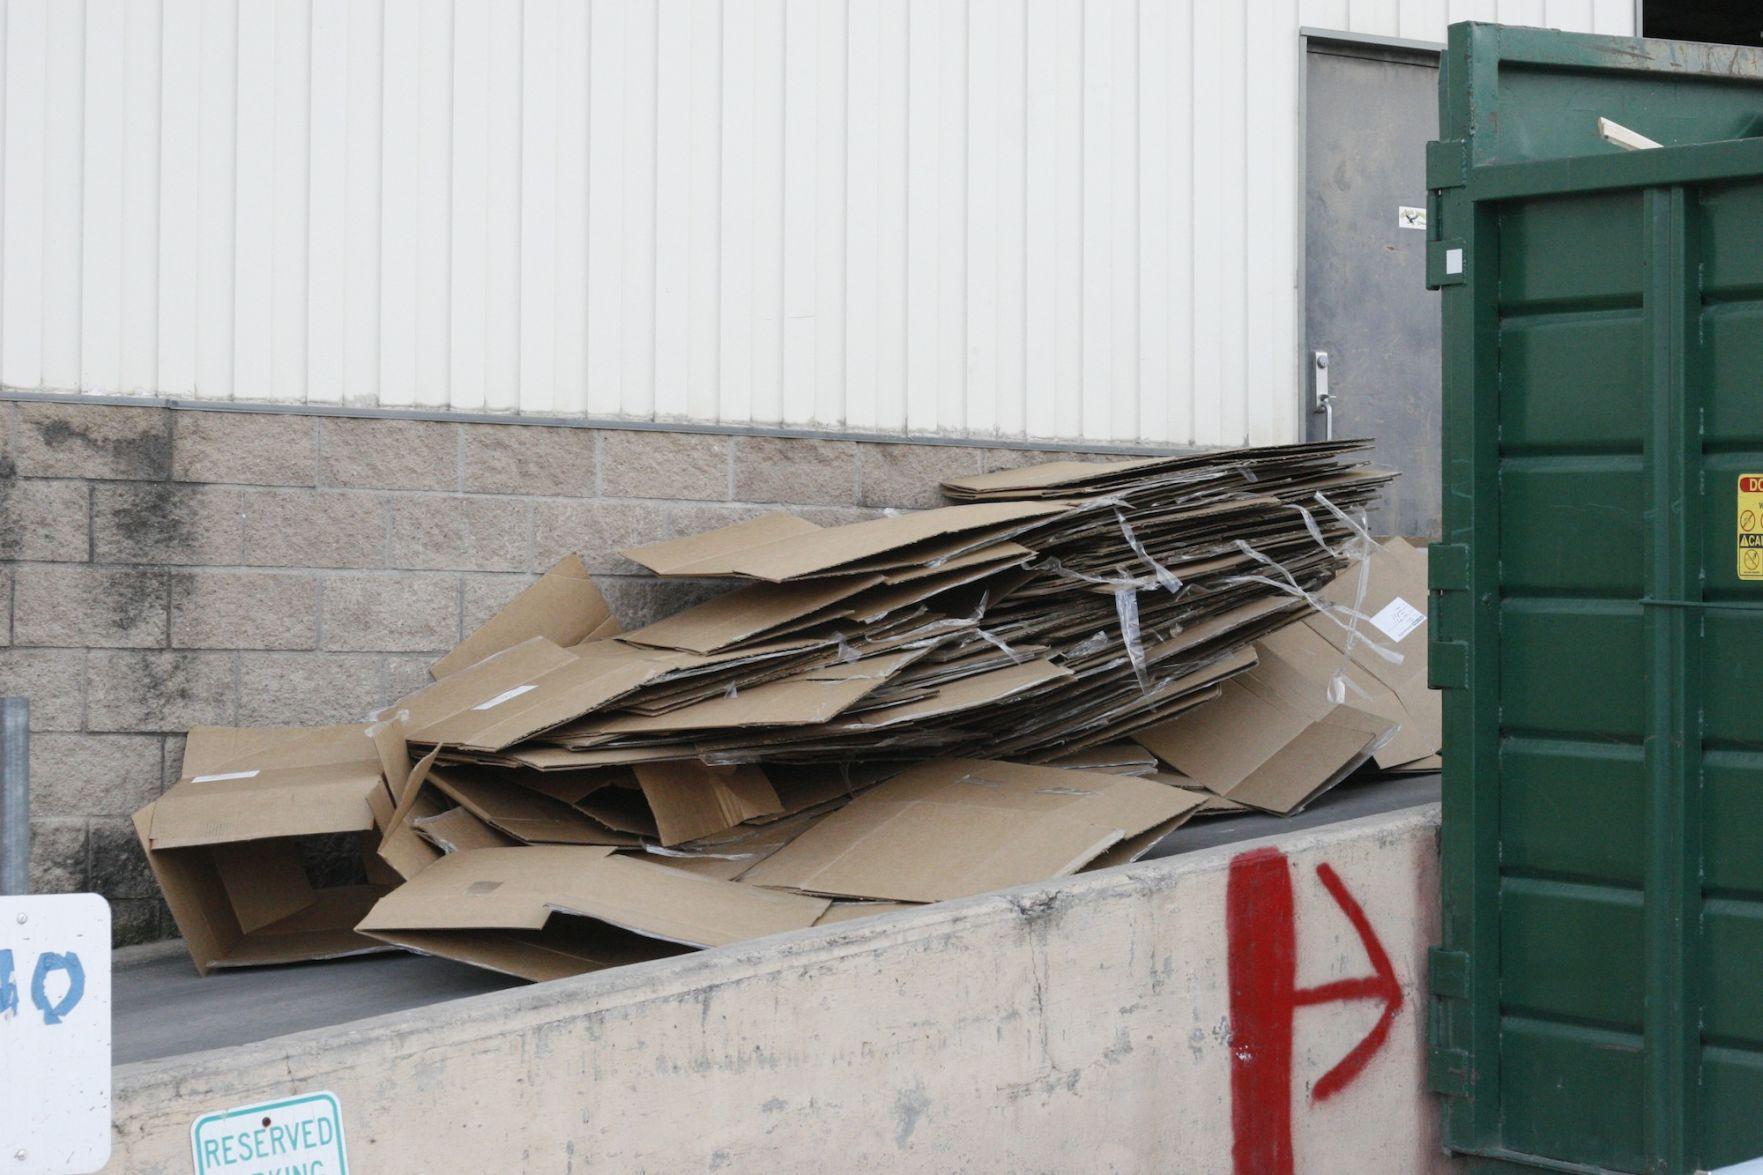 cardboard boxes (copy)